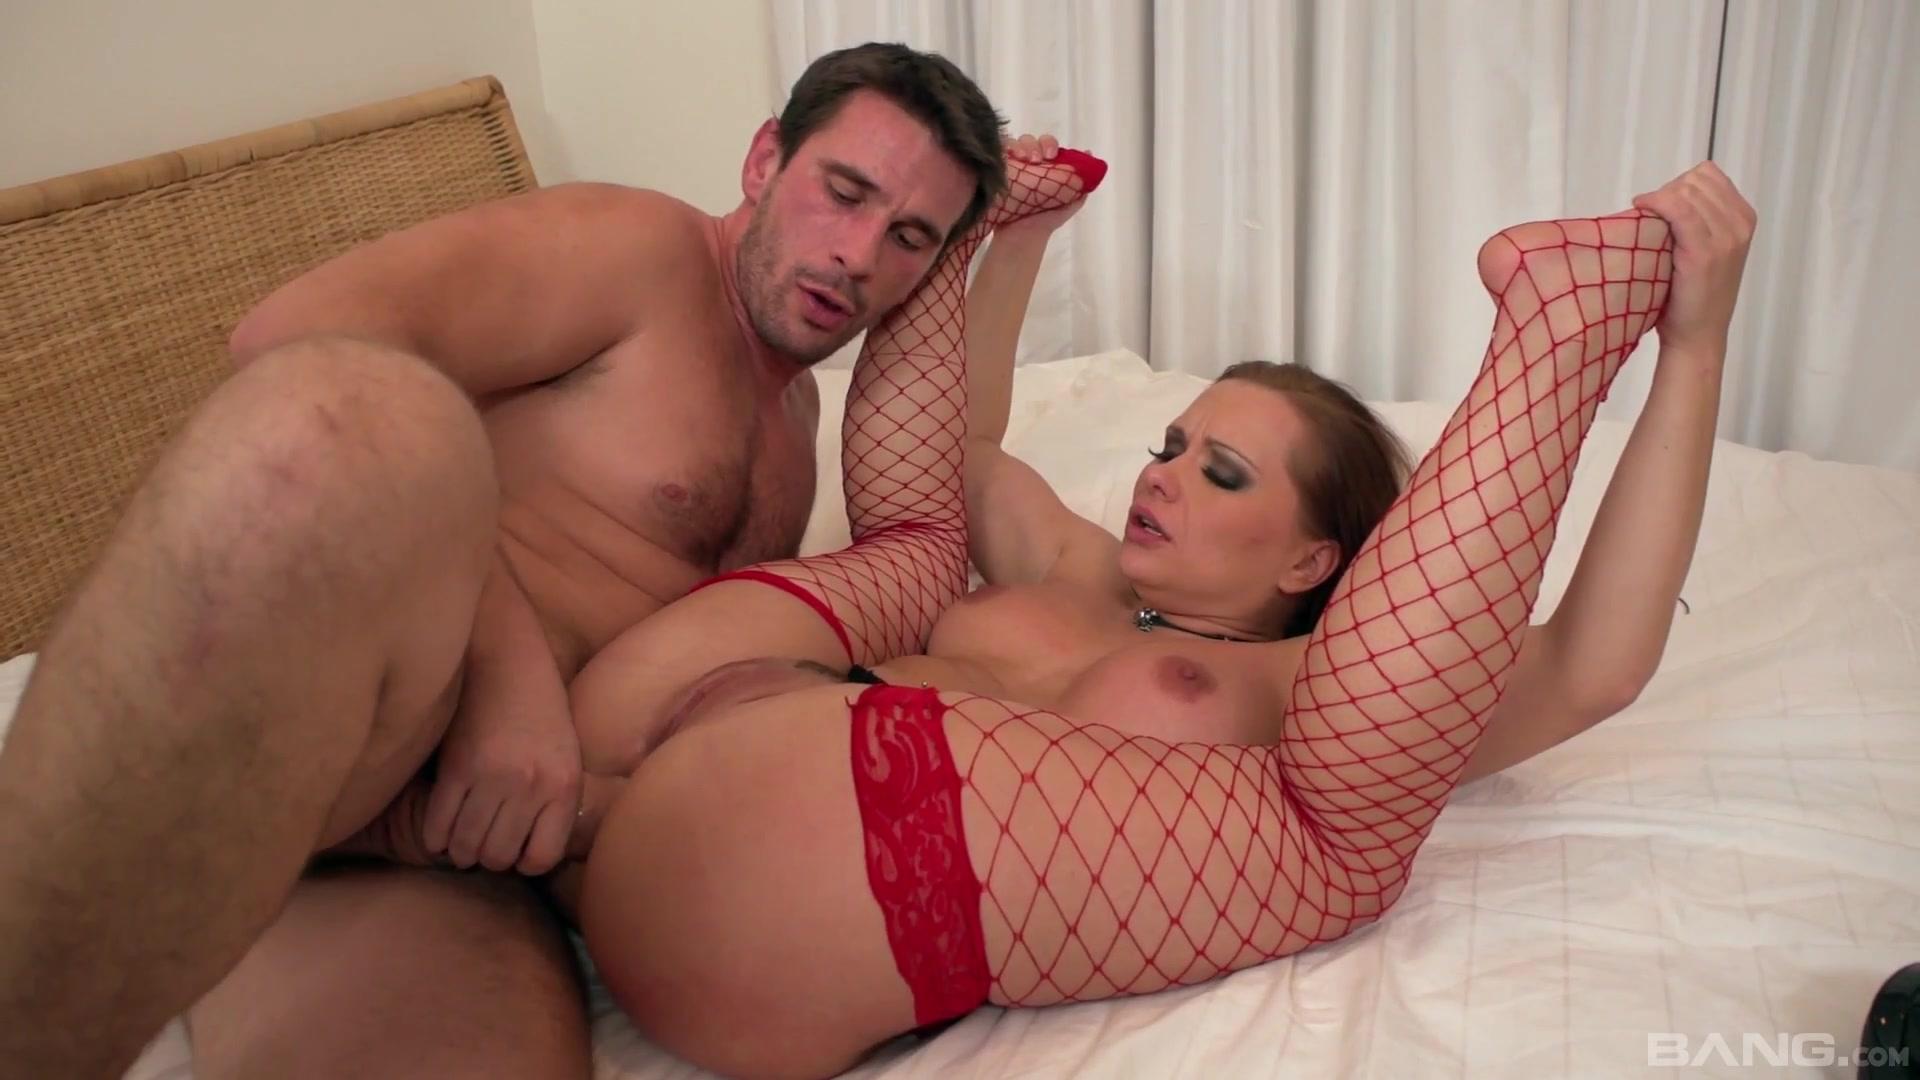 Anal Porno Mom crazy mom porn in anal scenes and insane oral sex